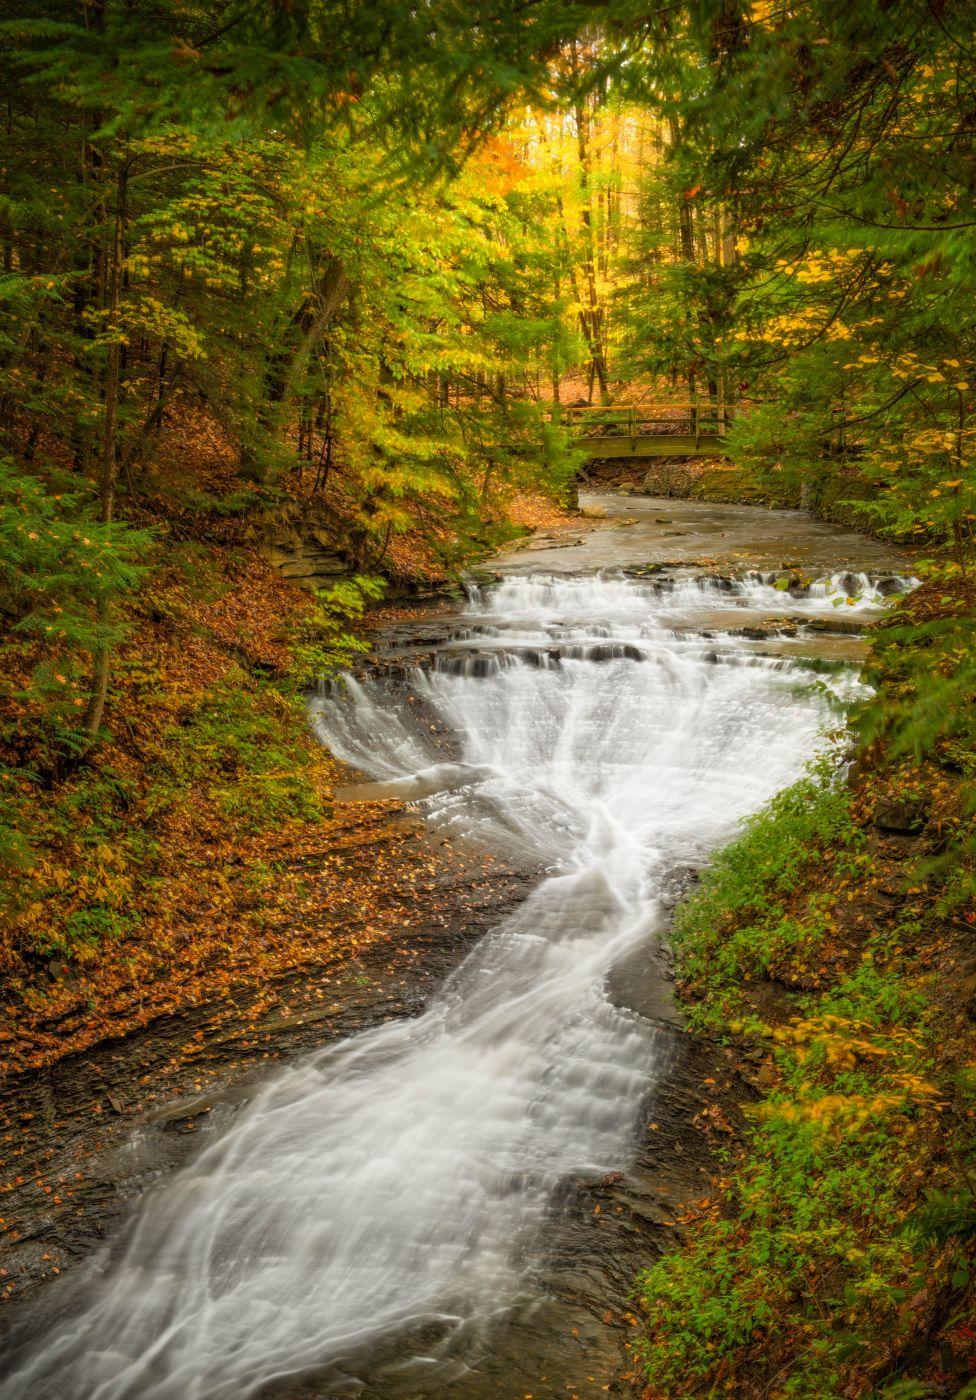 Bridal Veil Falls, USA